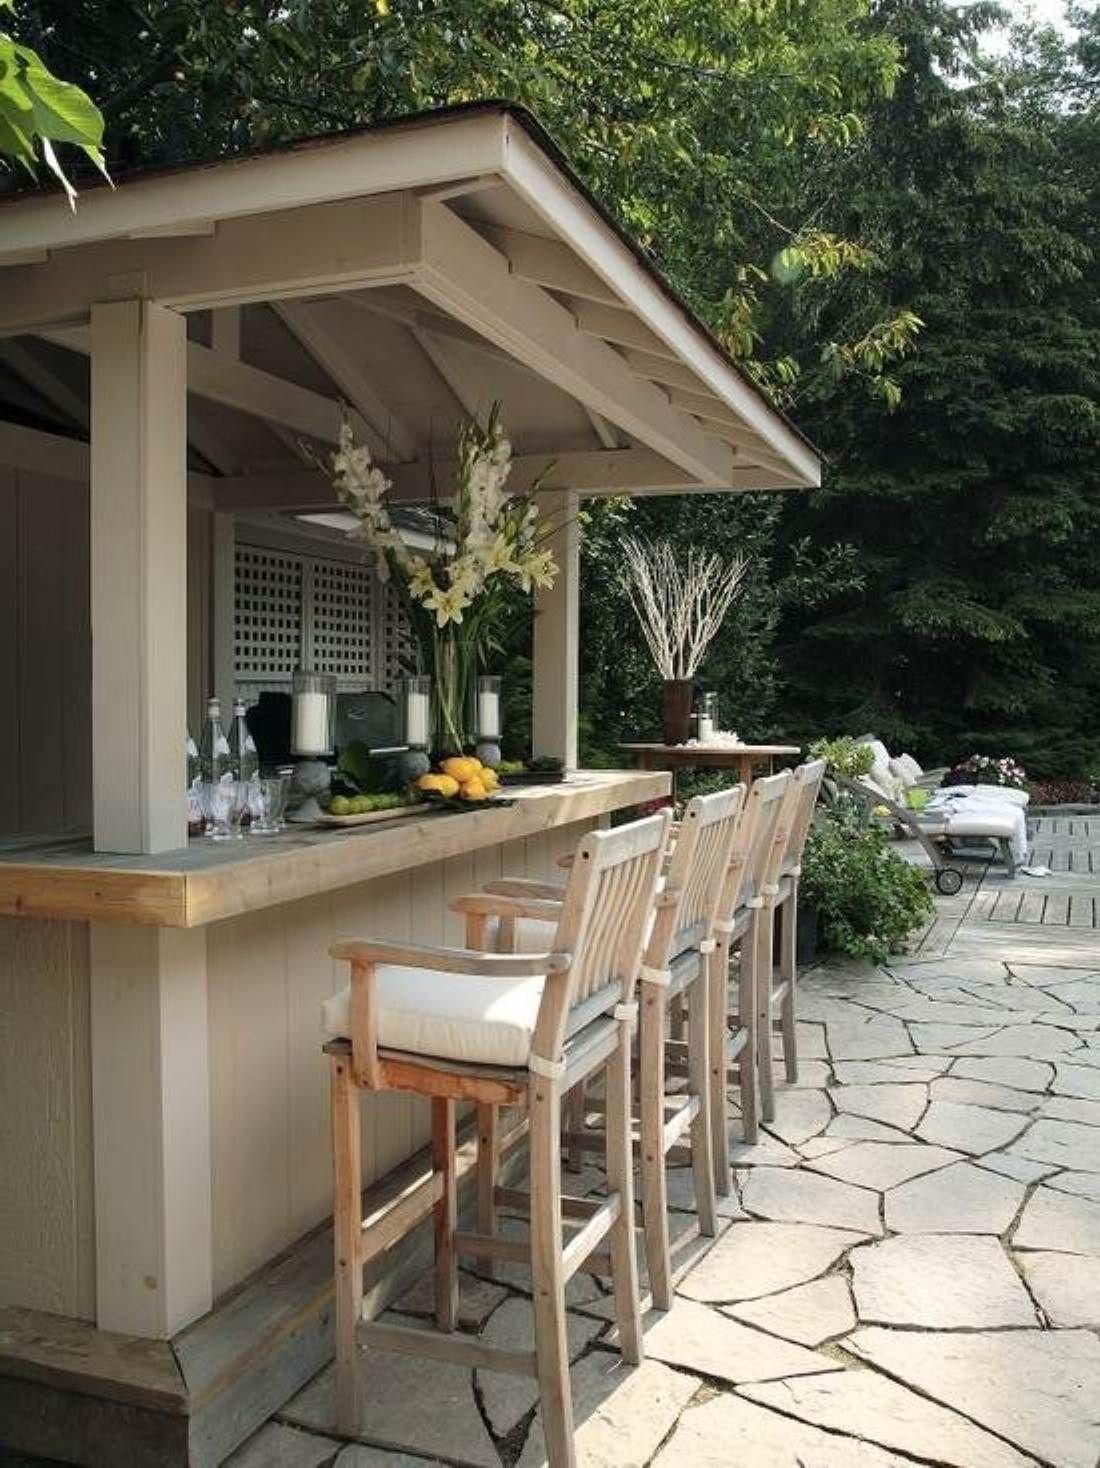 Pin by Frances Jones on home | Diy outdoor bar, Backyard ... on Backyard Pool Bar Designs  id=22770